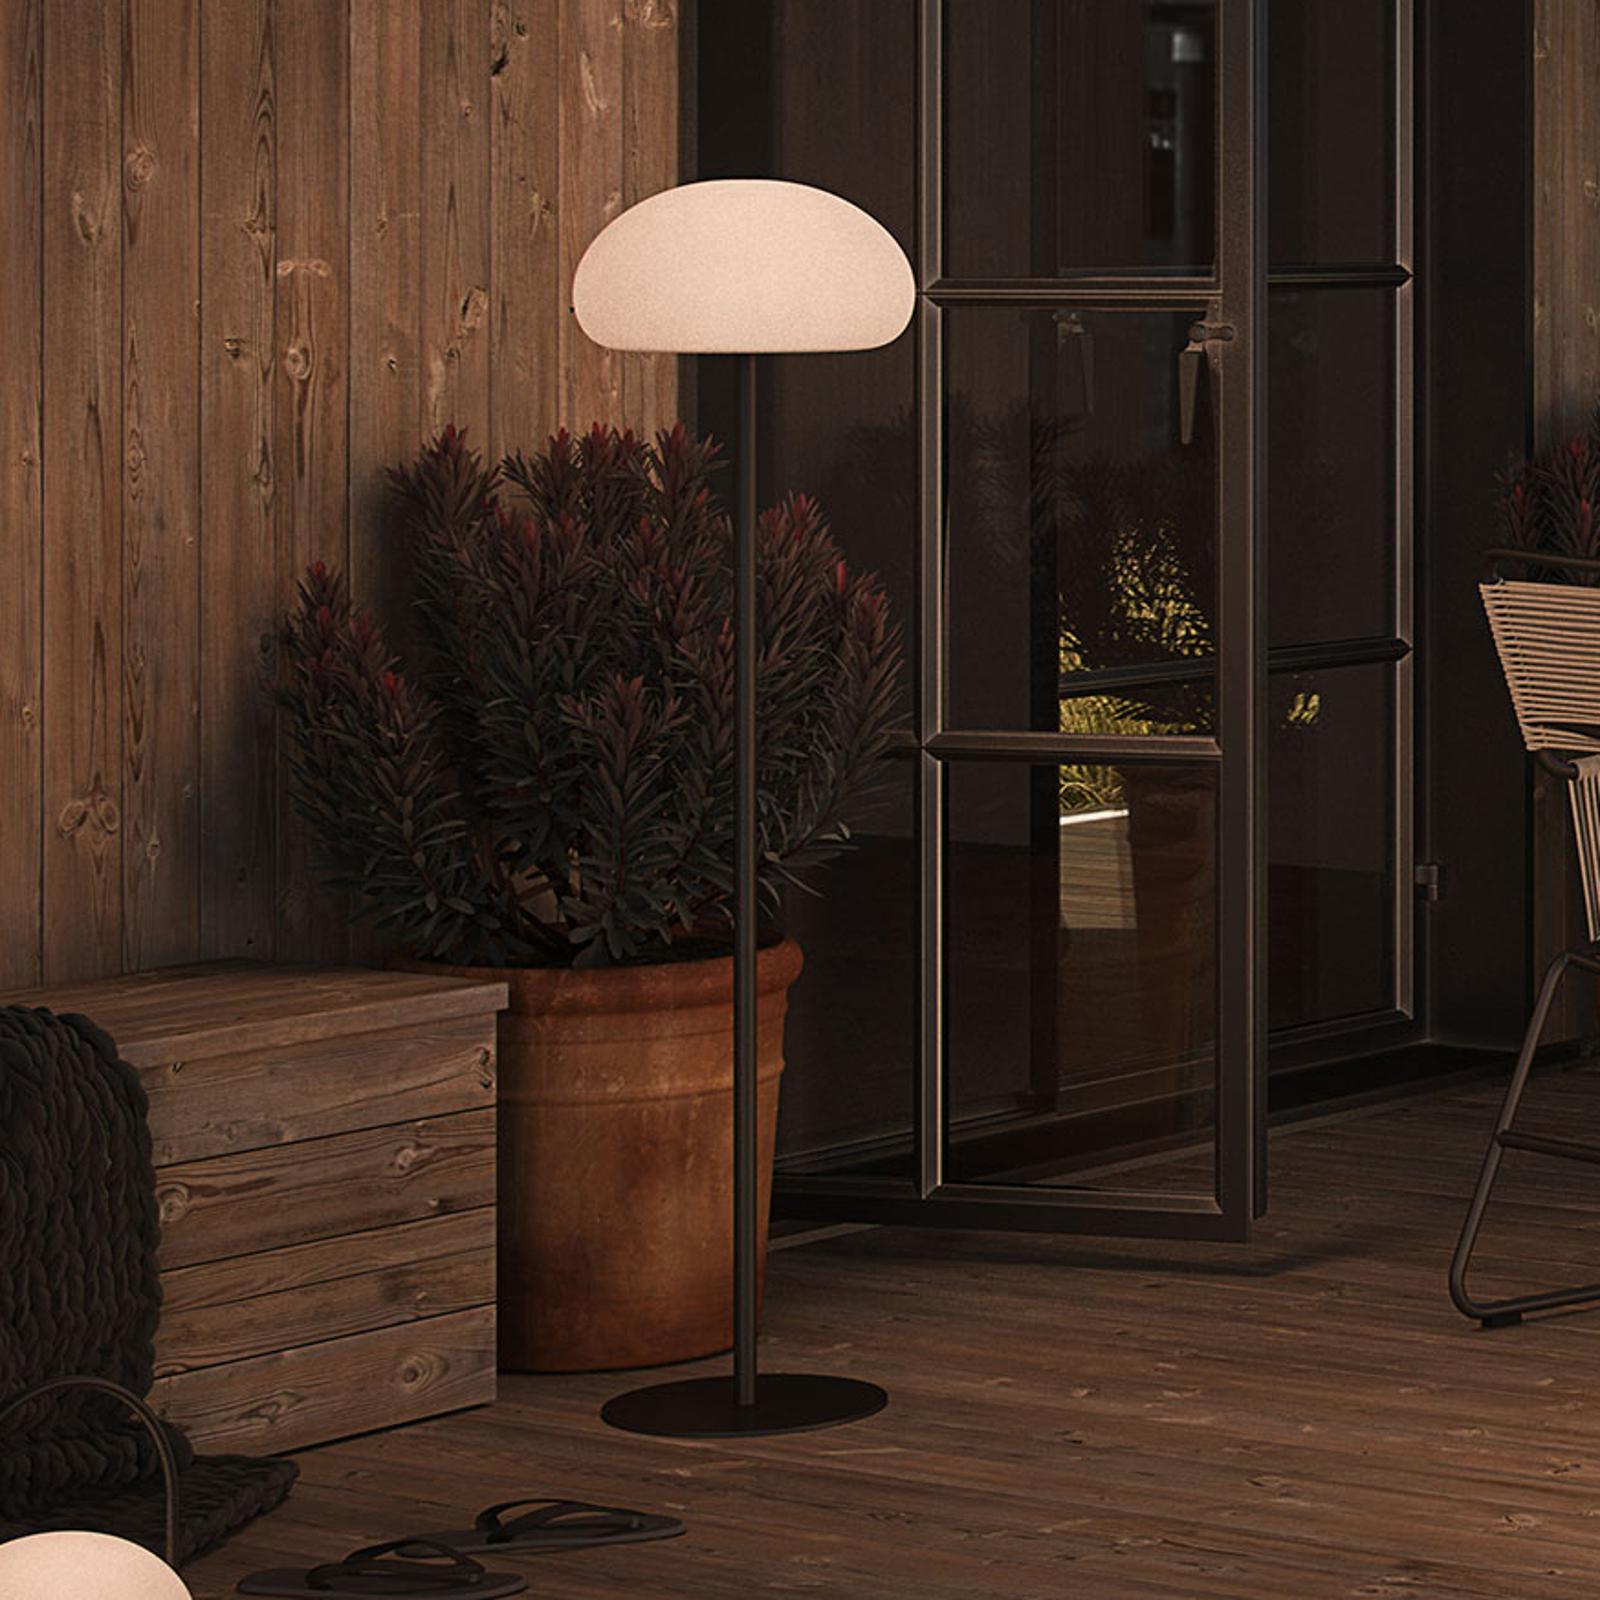 Lampa stojąca LED Sponge floor na taras